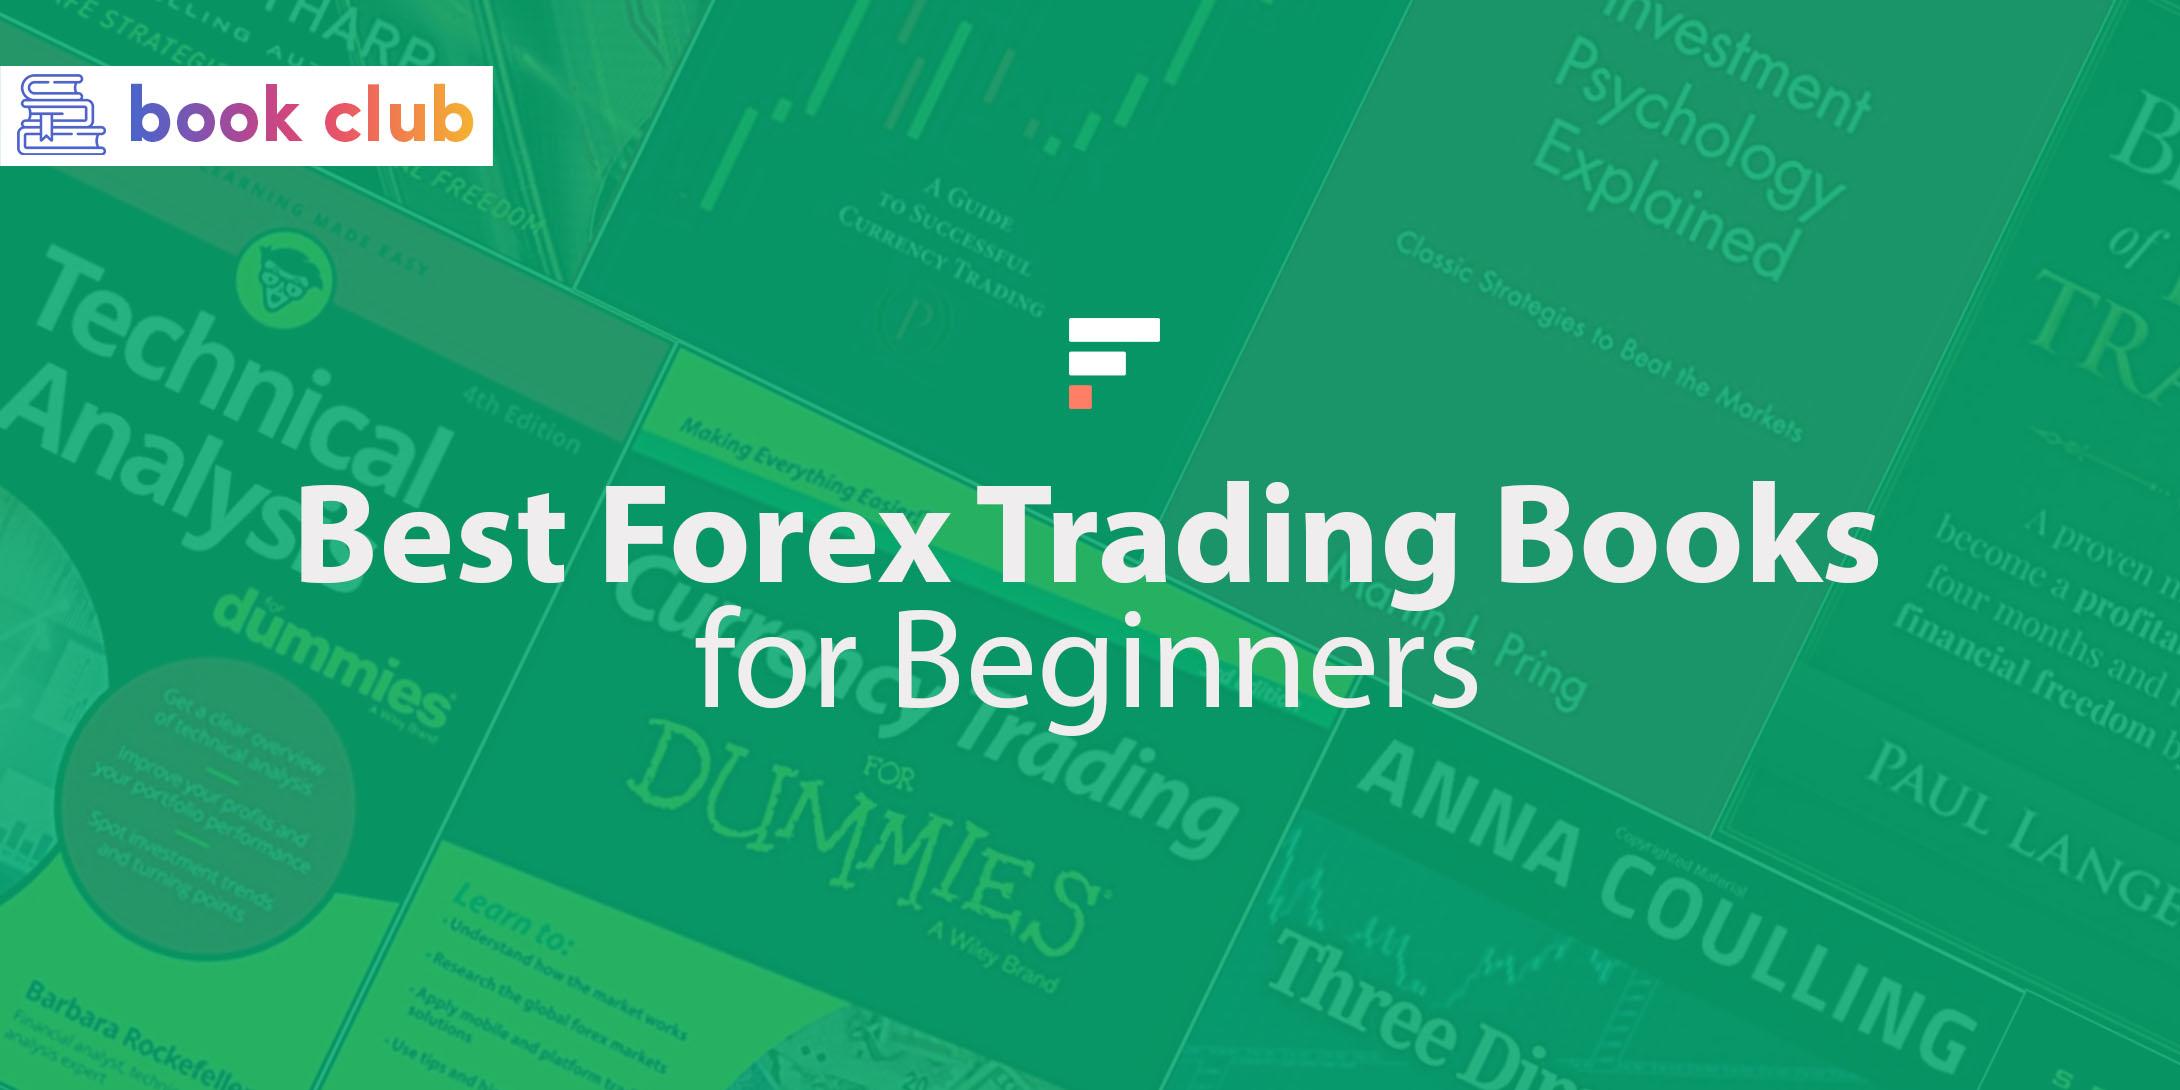 Best forex trading books for beginners